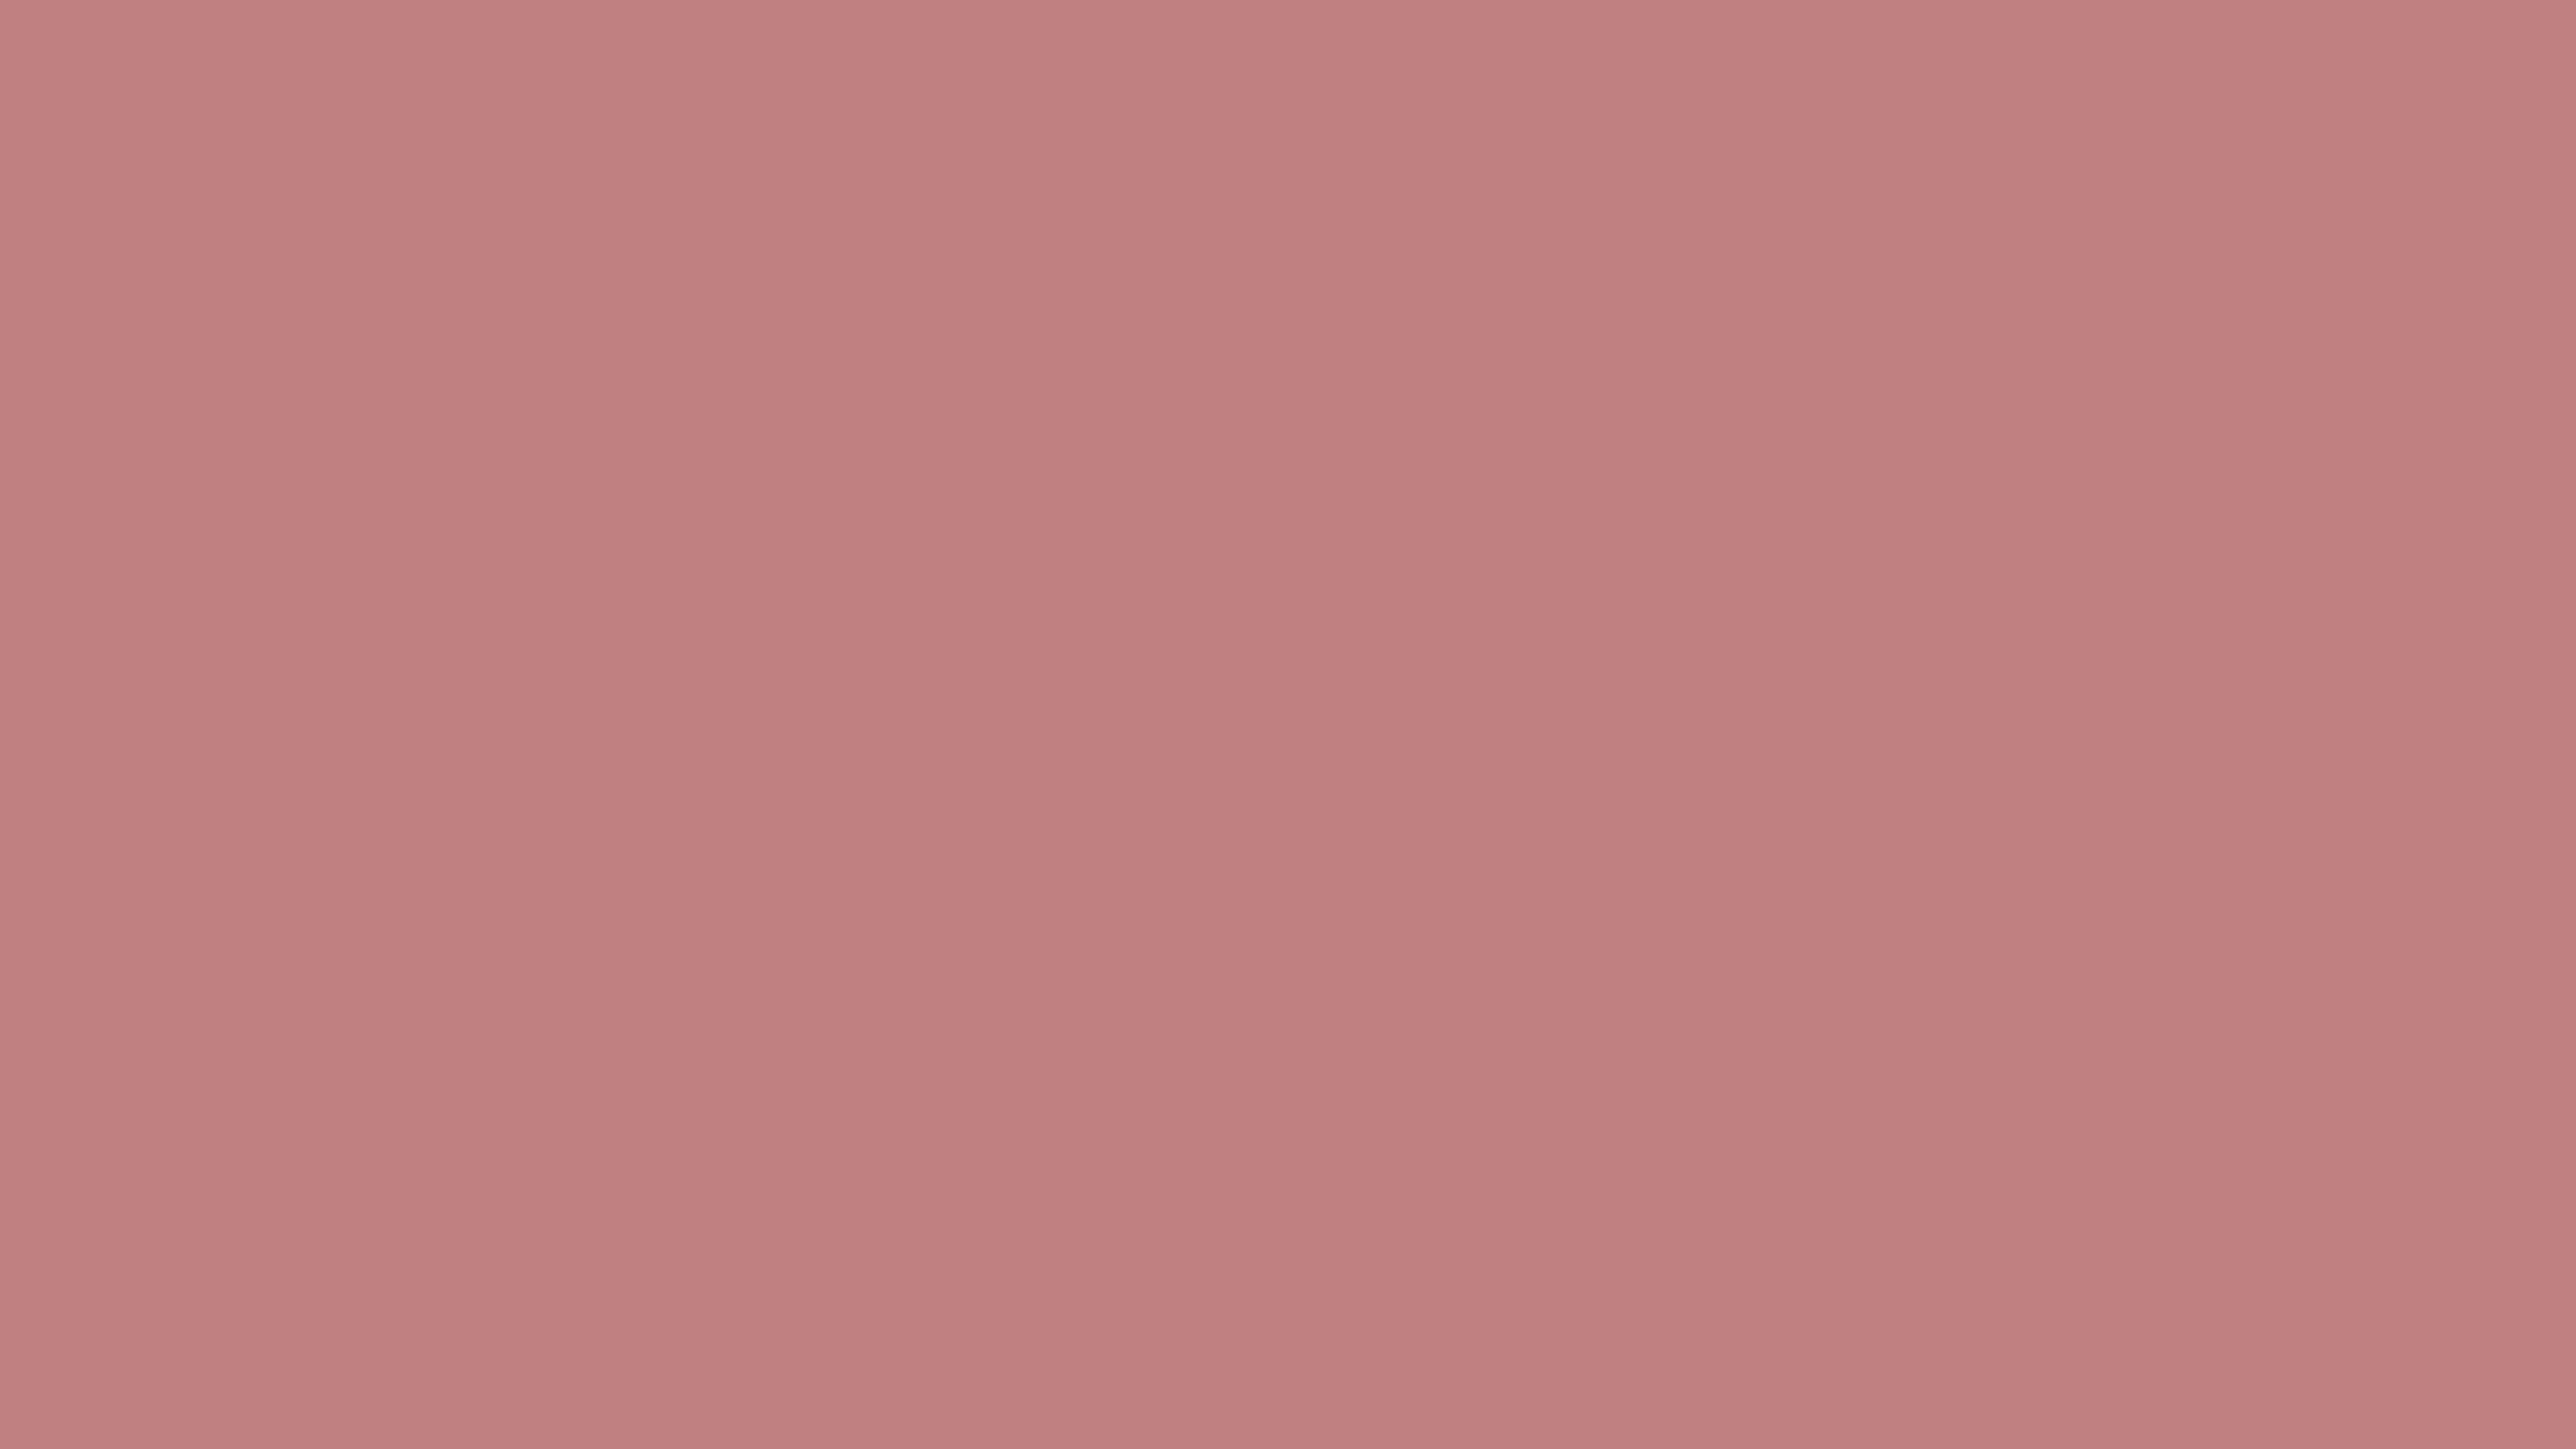 7680x4320 Old Rose Solid Color Background